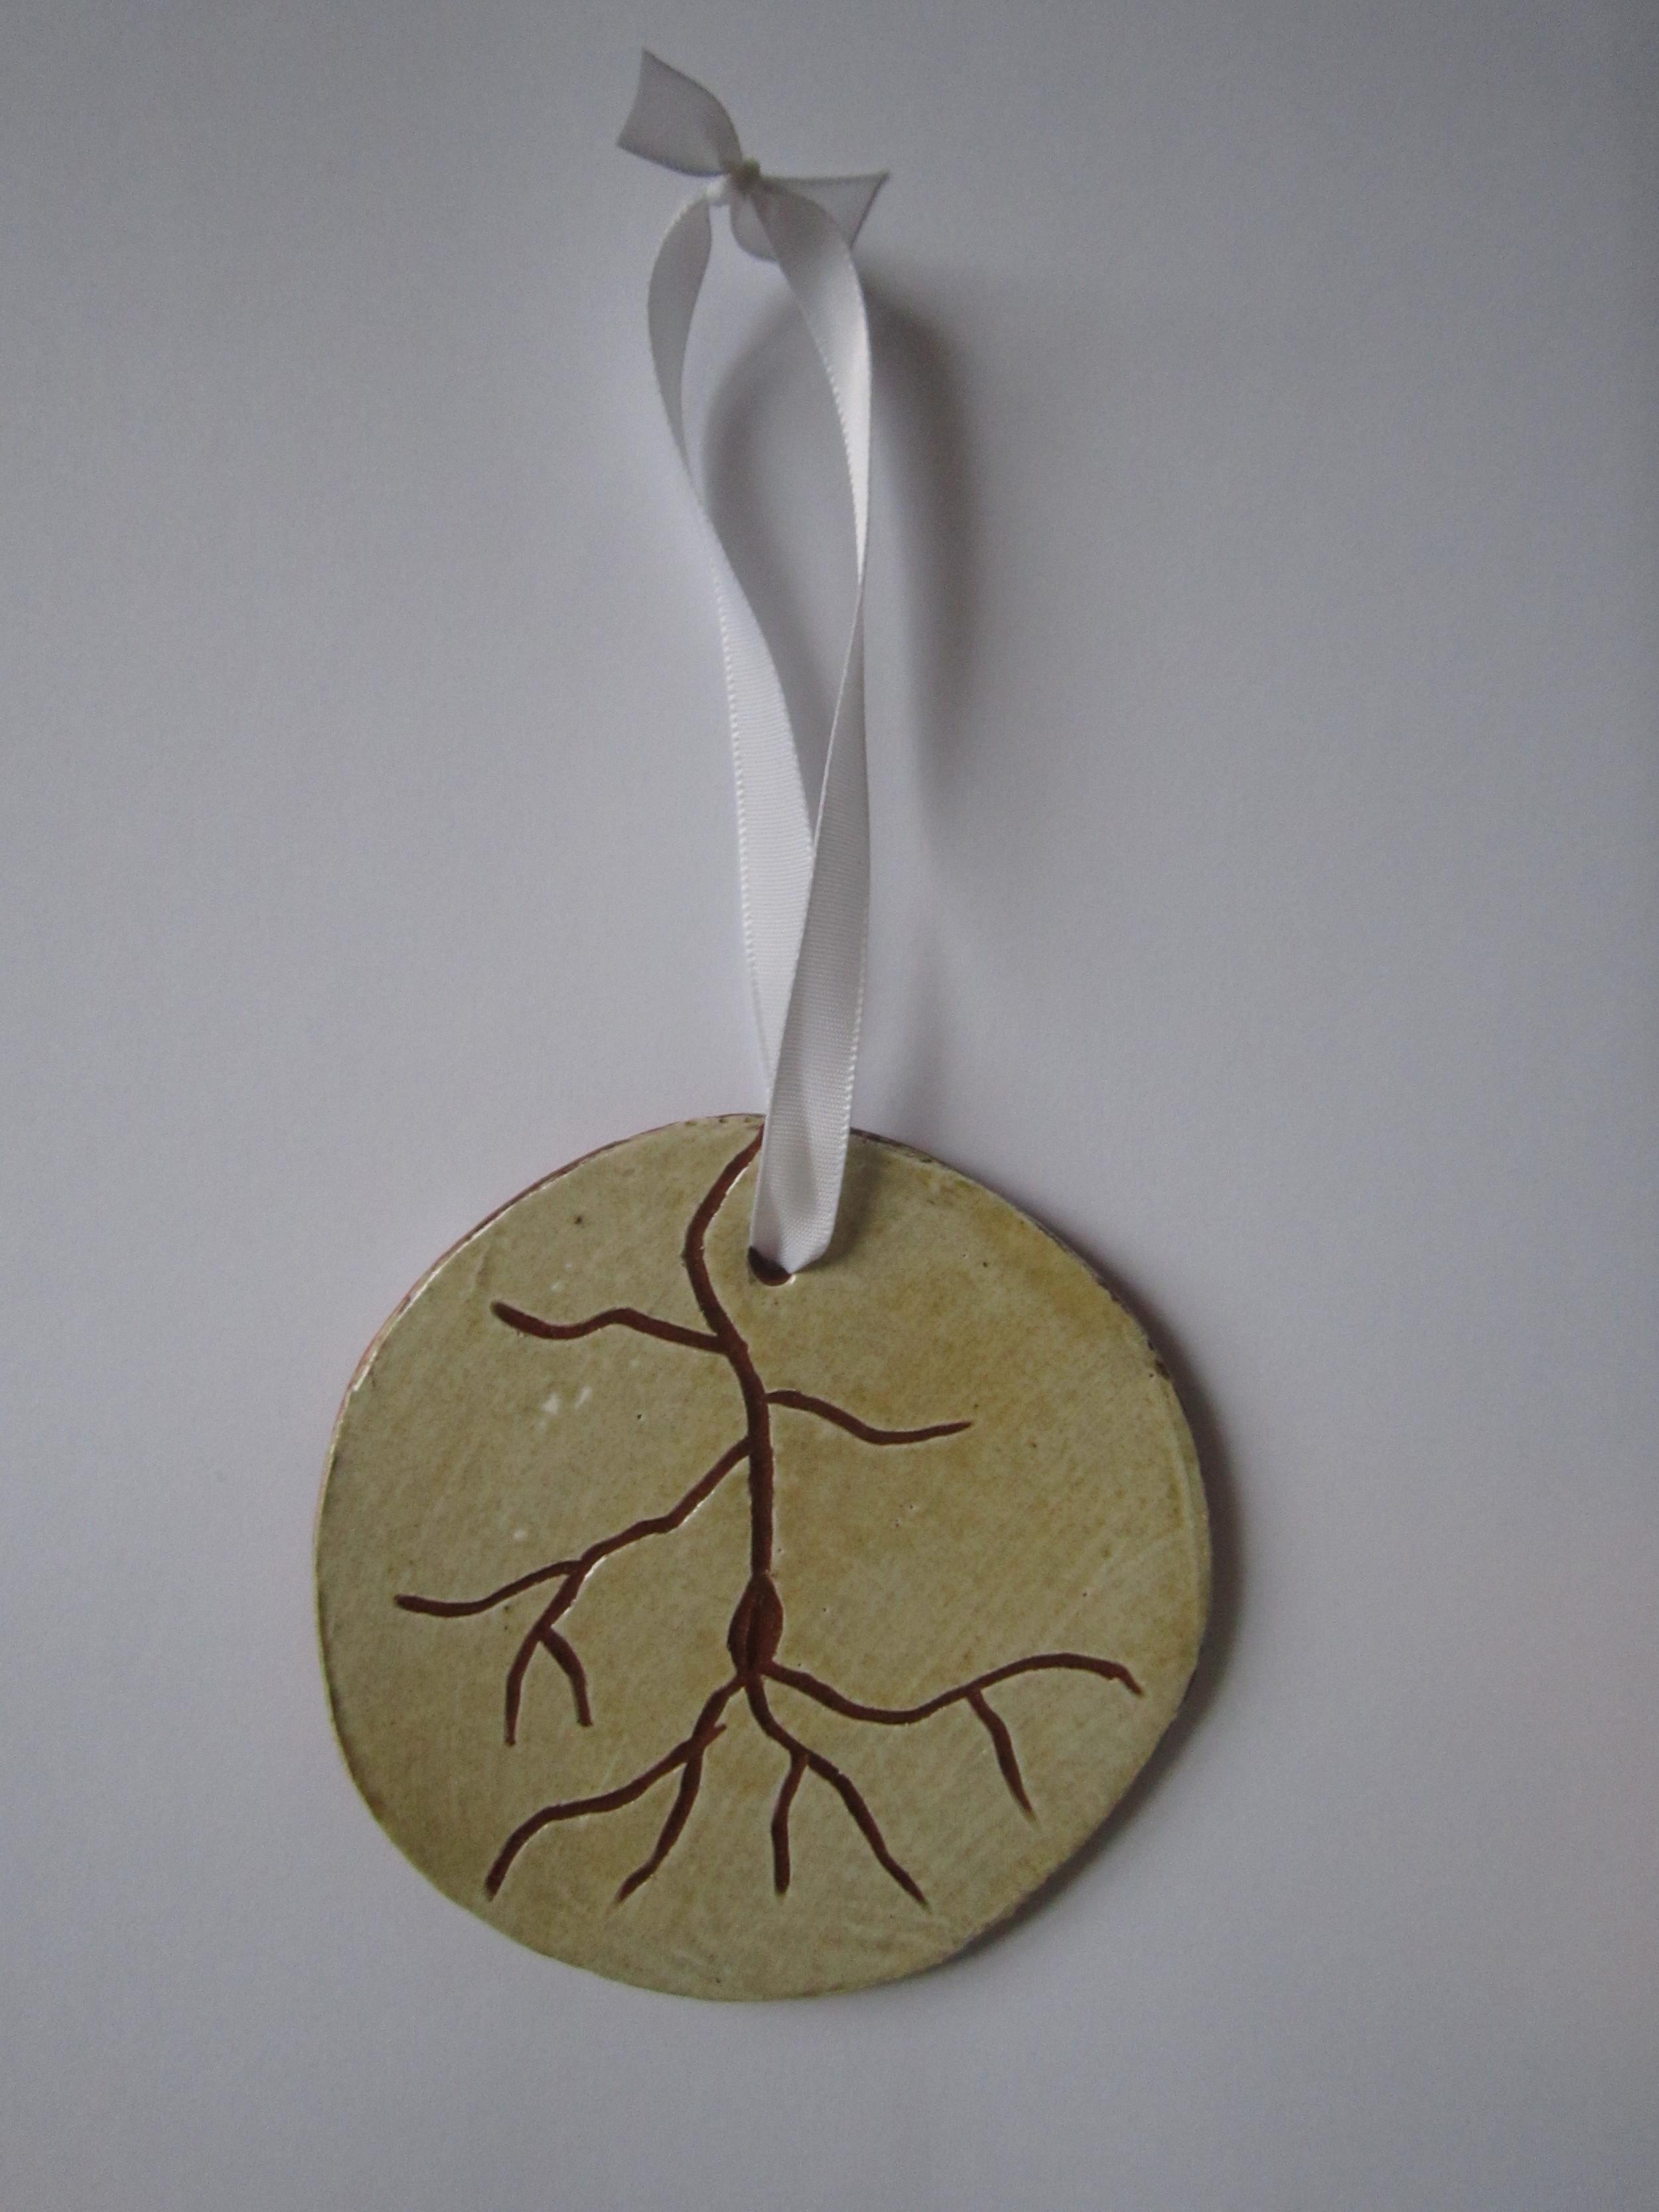 Beige Neuron Ornament 1.JPG